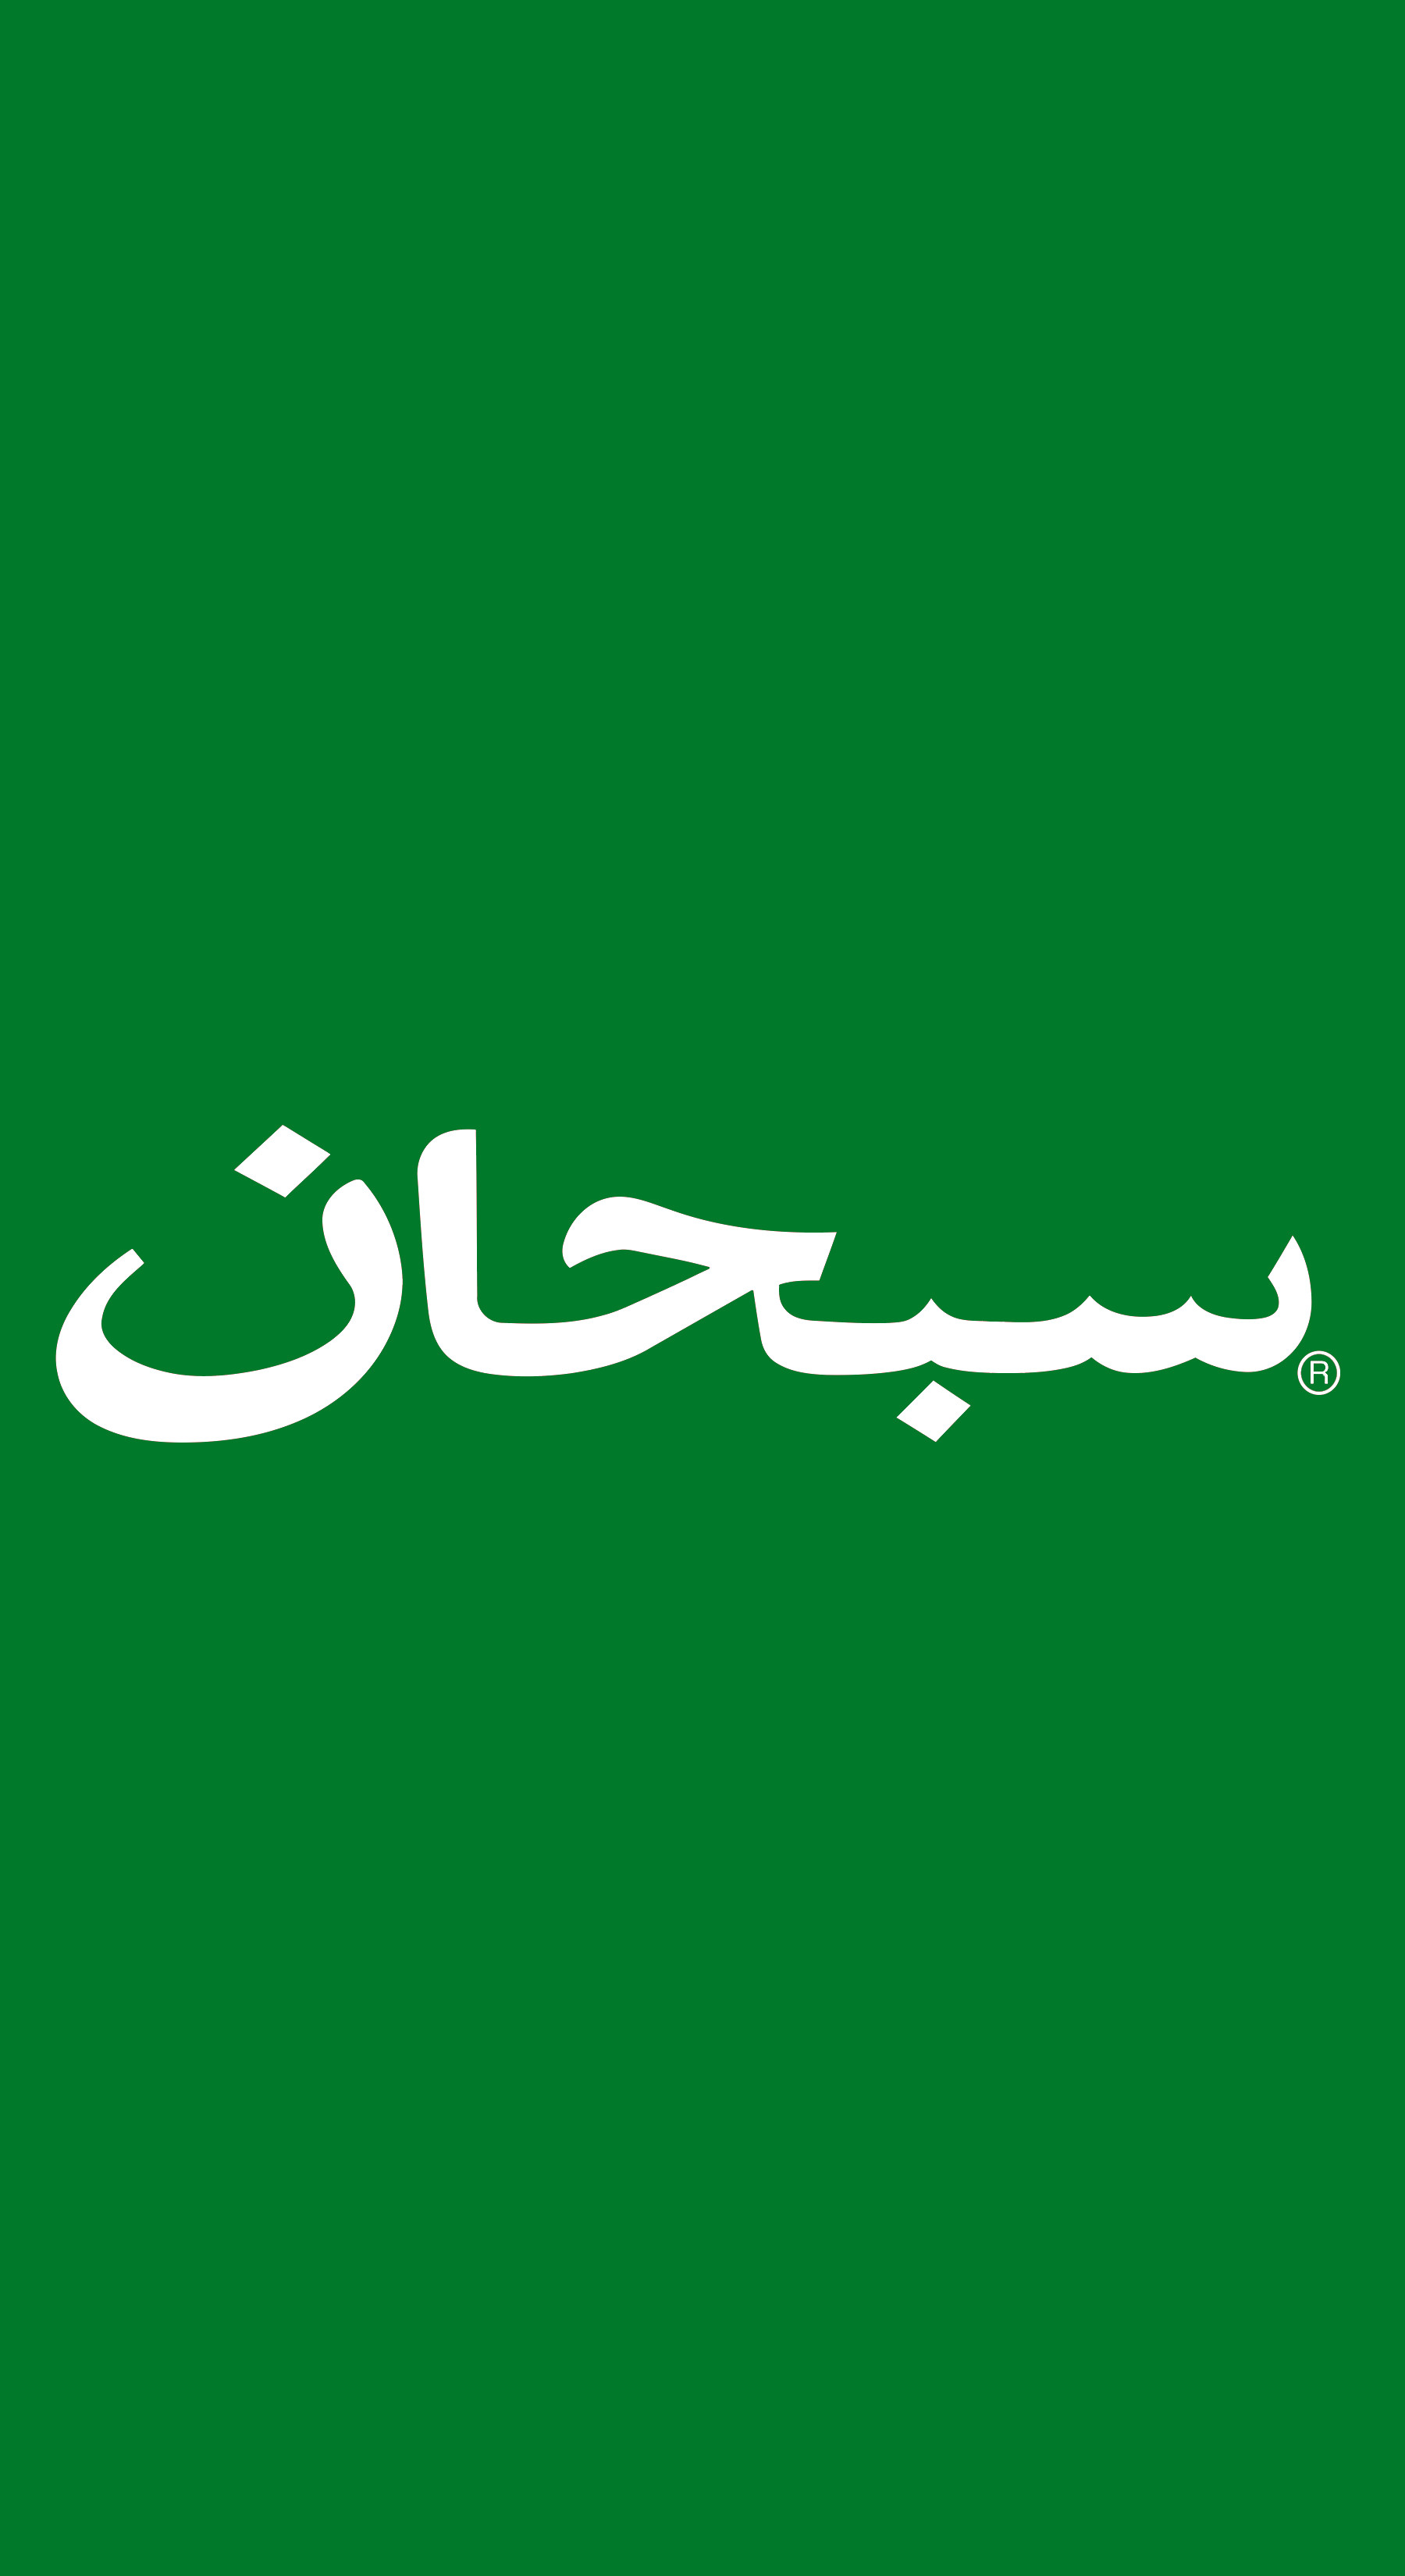 1800x3300, I Really Like The Supreme Arabic Logo, So - Supreme Arabic - HD Wallpaper